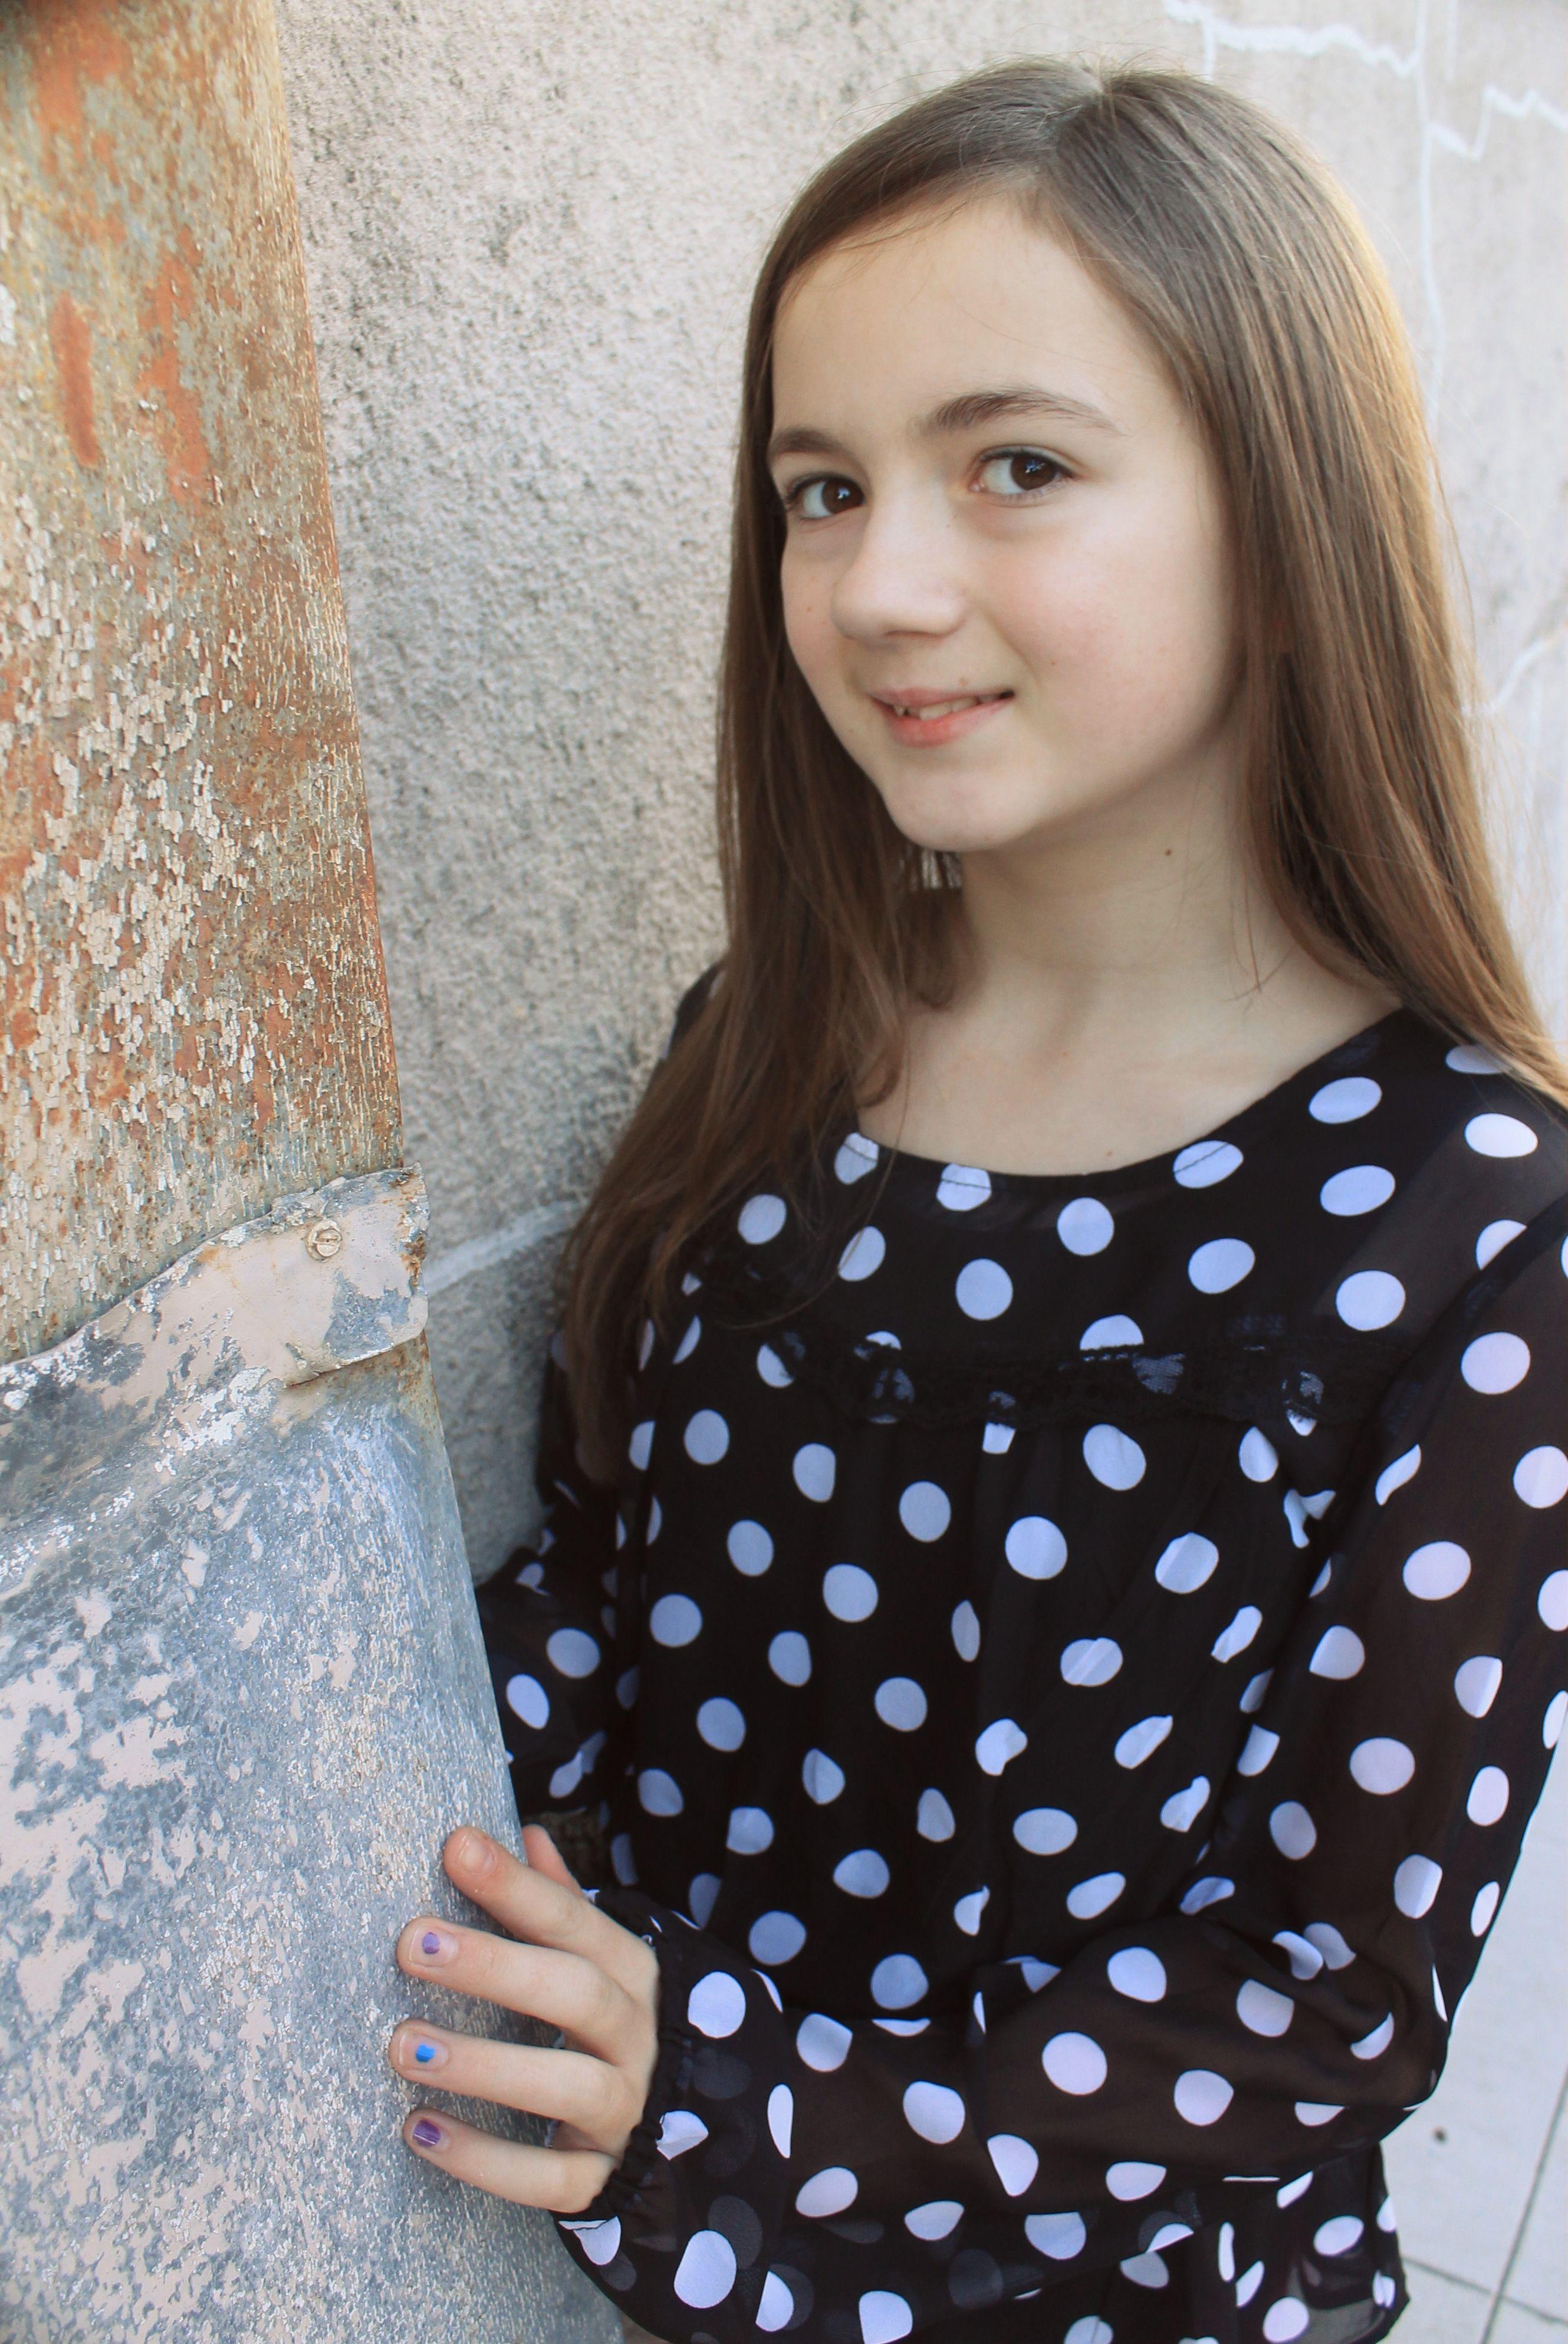 11 year old girl portrait shots fashion portrait photo